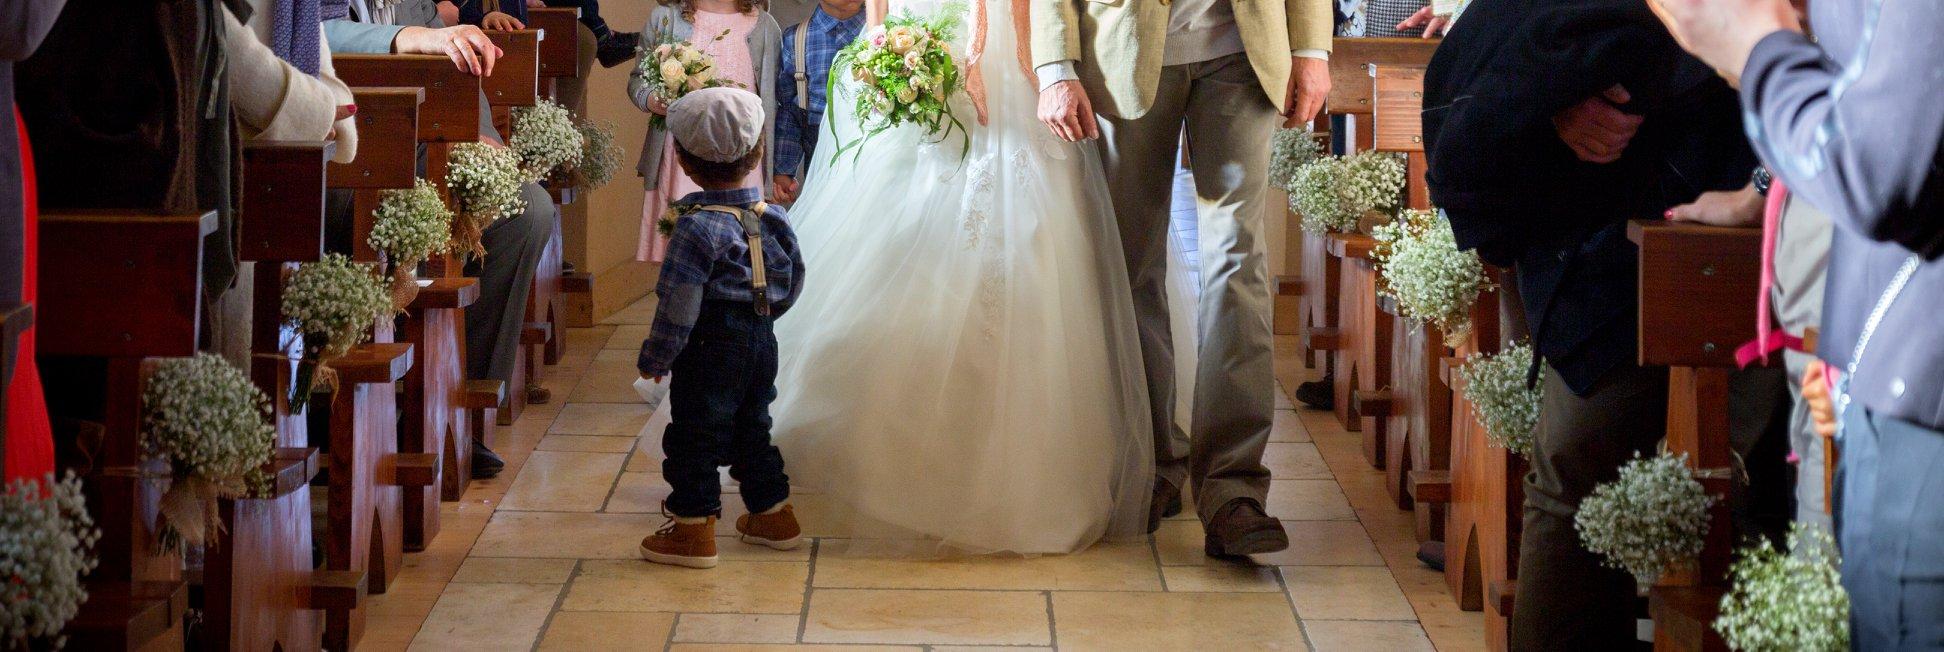 mariage-fleuriste-l'astrantia-annecy